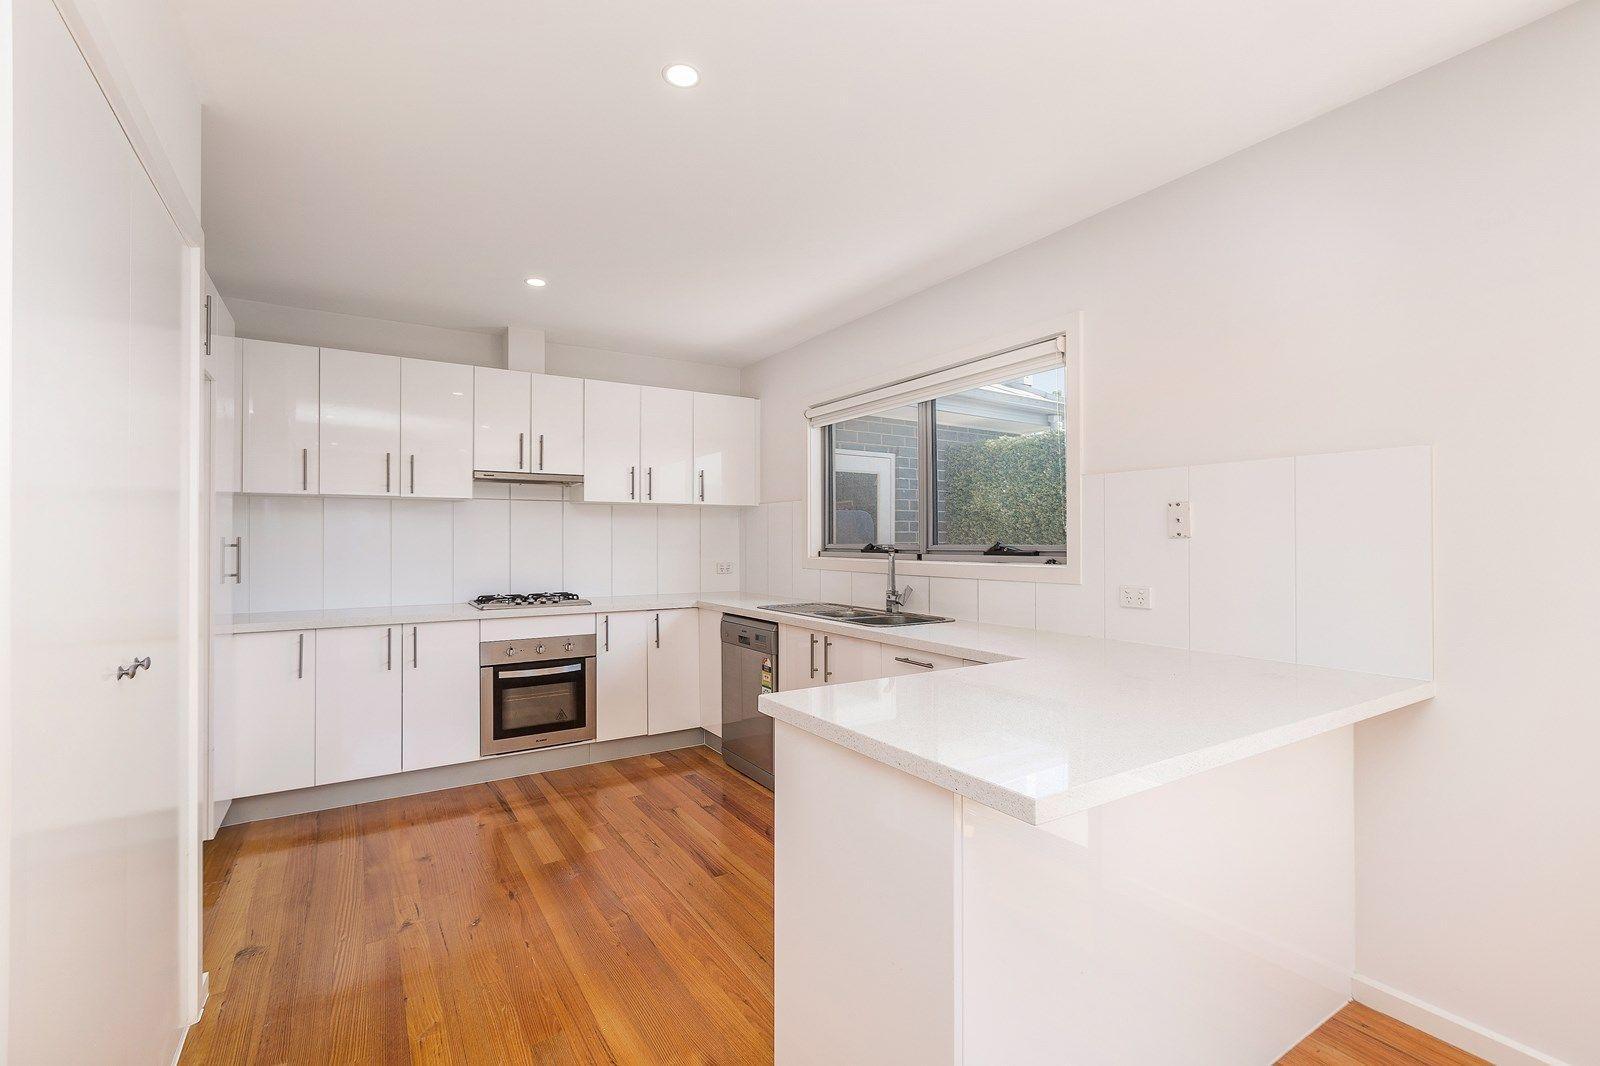 3/21B Dongola Road, West Footscray VIC 3012, Image 1